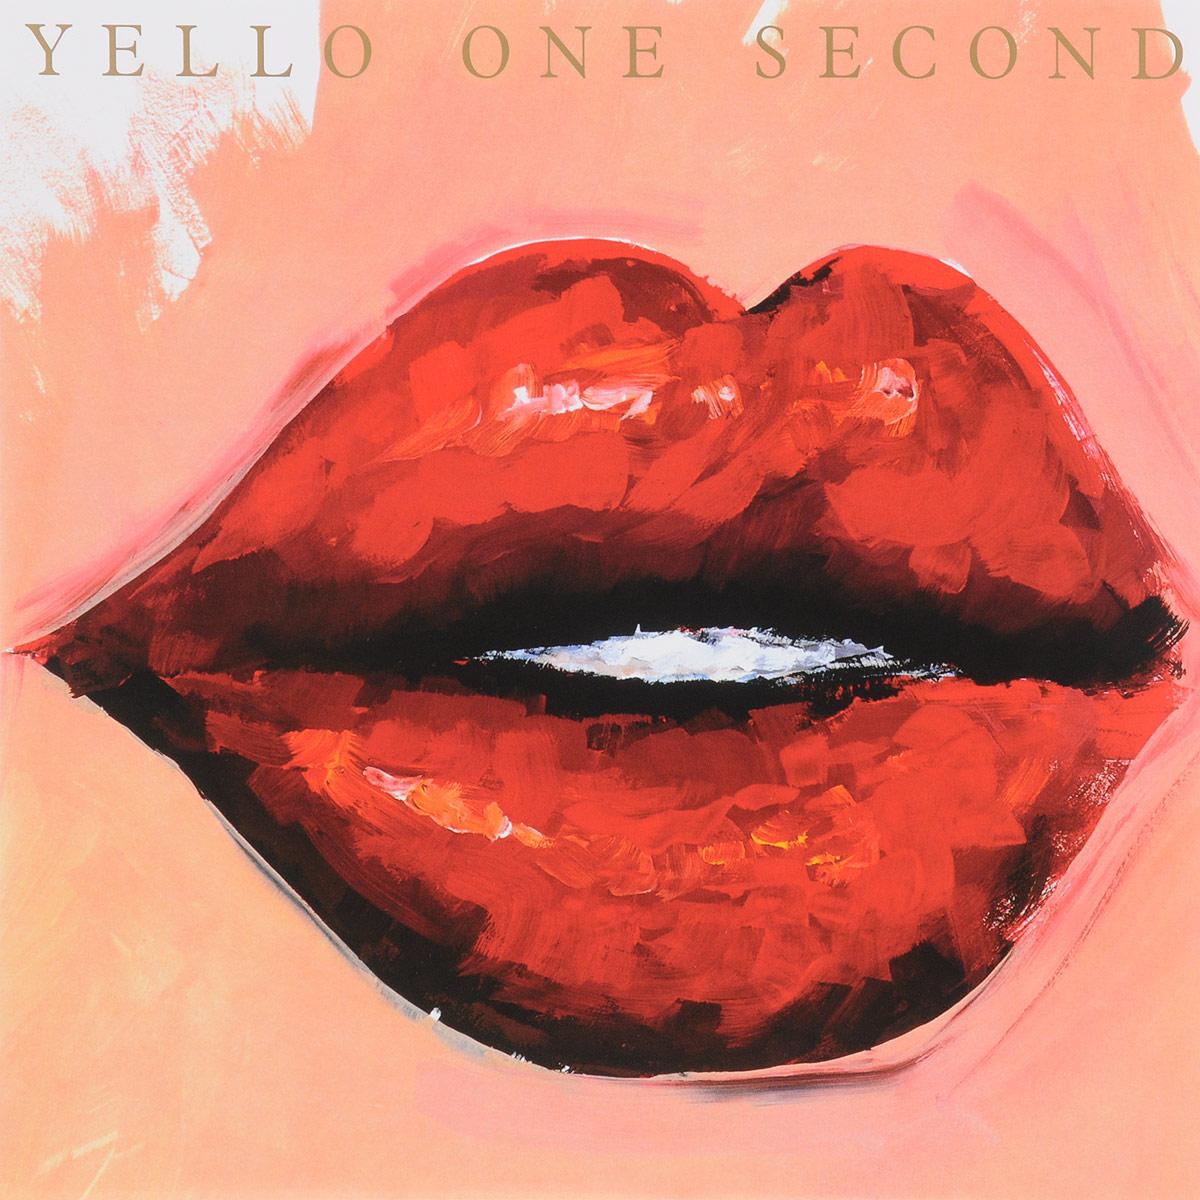 Yello Yello. One Second (LP) yello yello flag